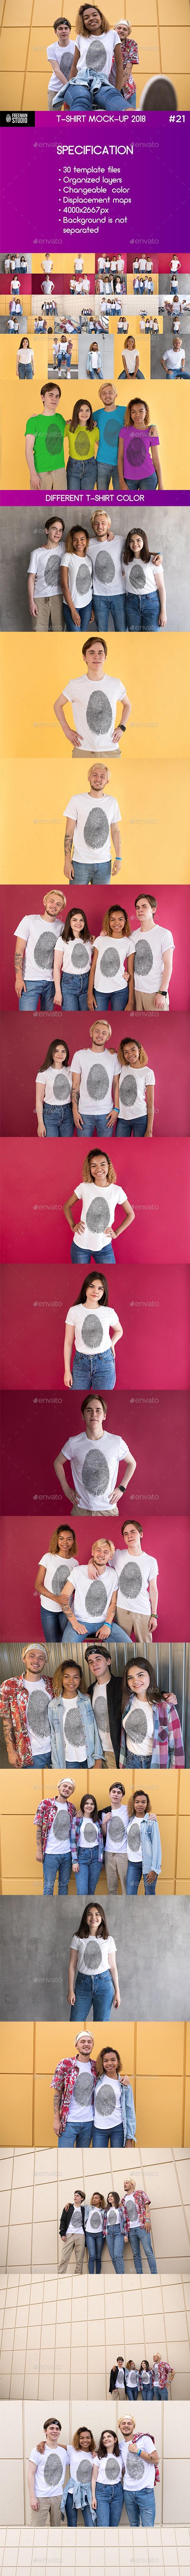 T-Shirt Mock-Up 2018 #21 - Product Mock-Ups Graphics